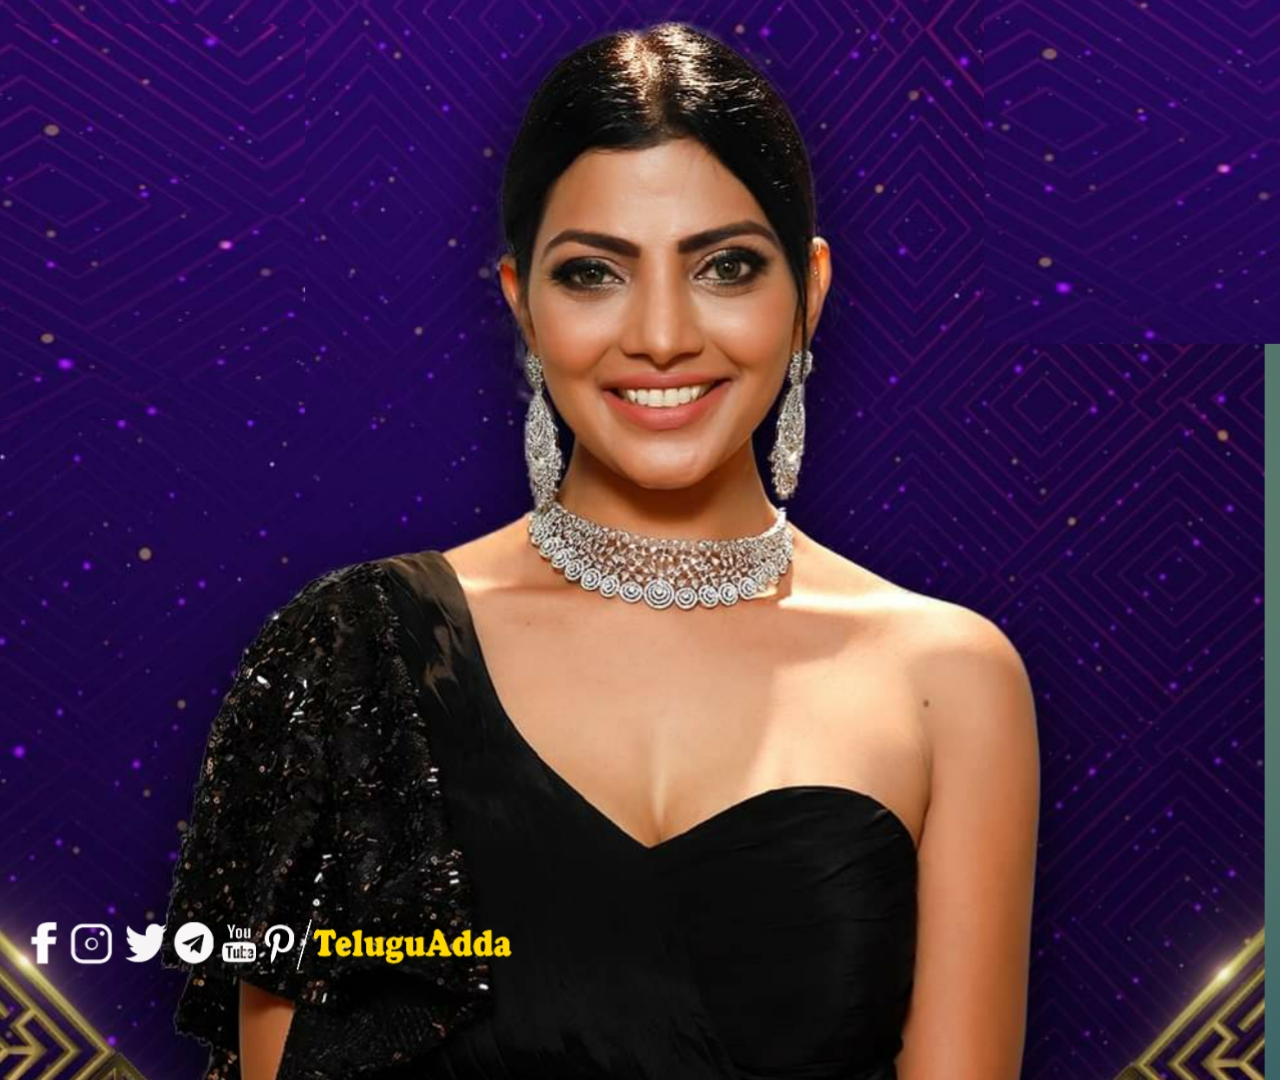 Bigg Boss 5 Telugu 3rd contestant Lahari